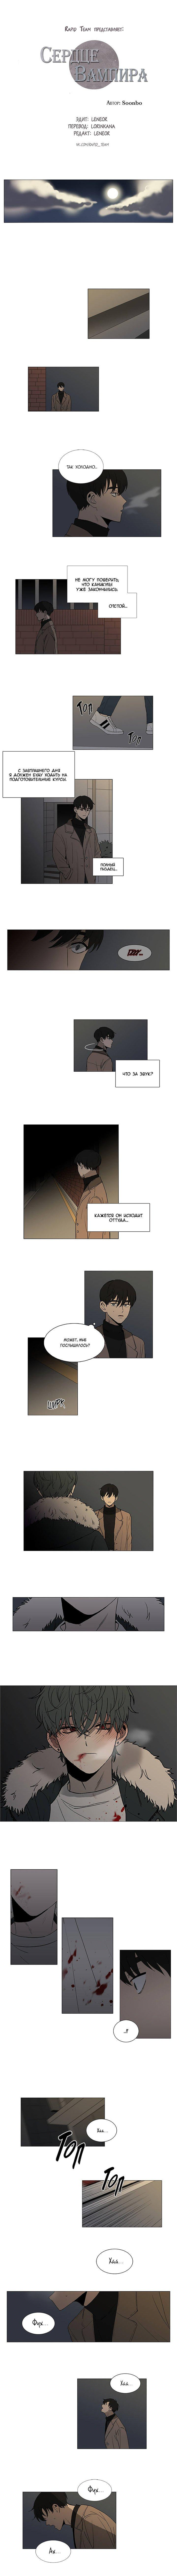 Манга Сердце Вампира - Глава 1 Страница 1